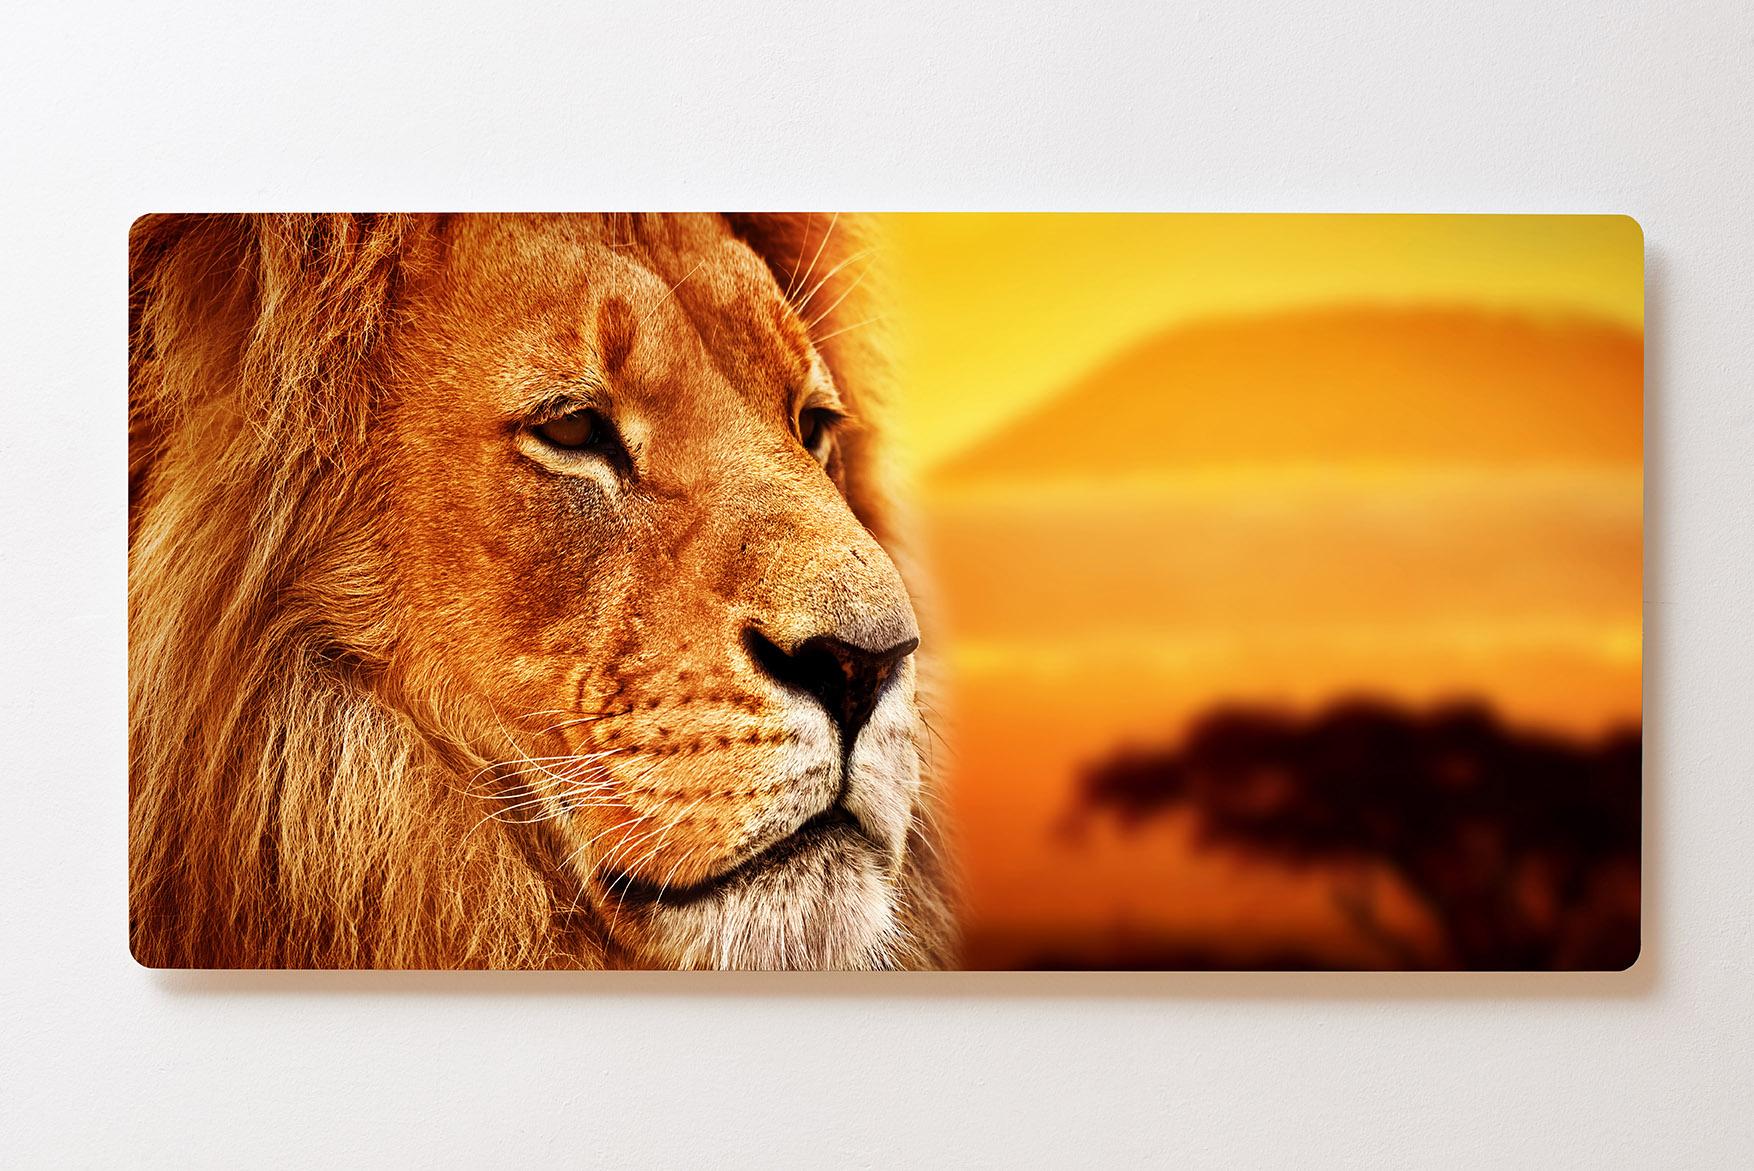 Magnettafel BACKLIGHT 120x60cm Motiv-Wandbild M107 Löwe Savanne